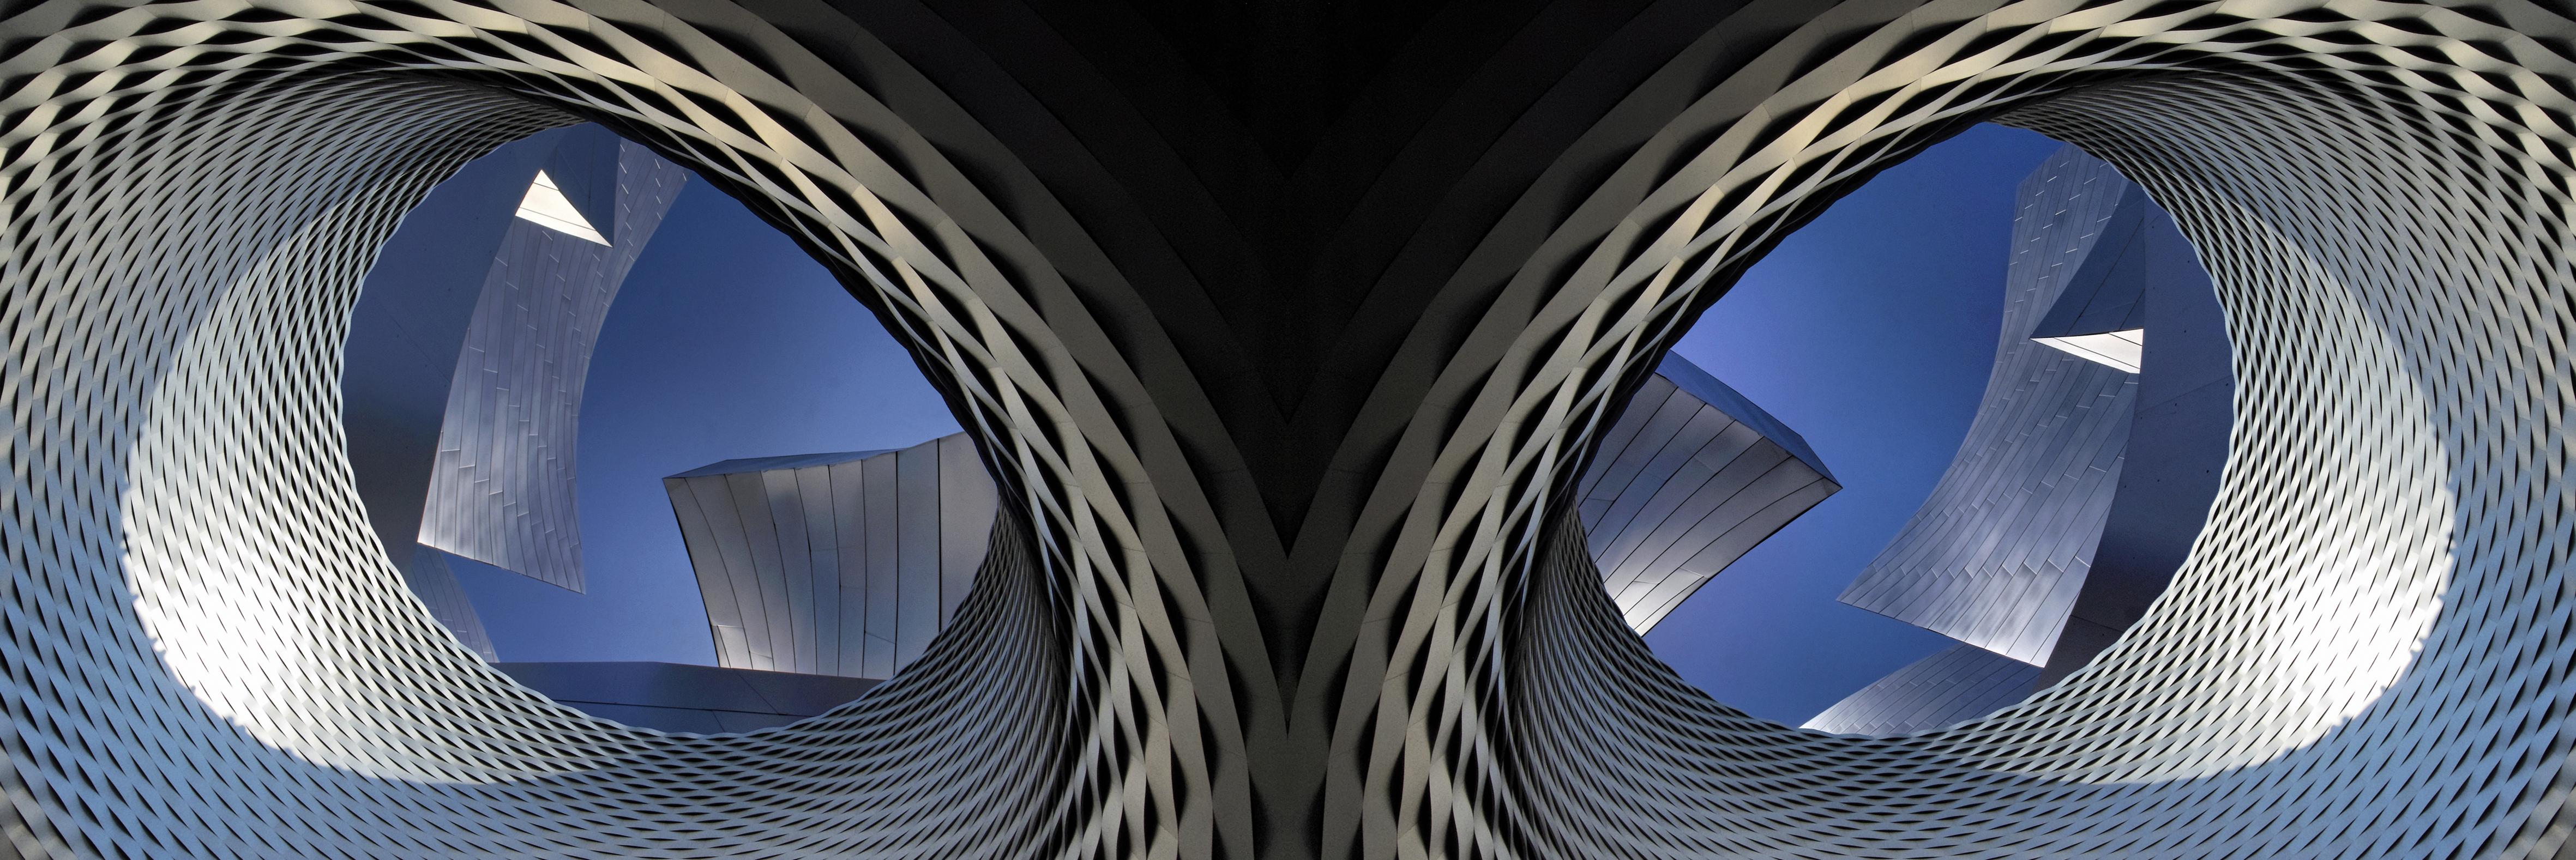 Herzog & de Meuron meets F. O. Gehry